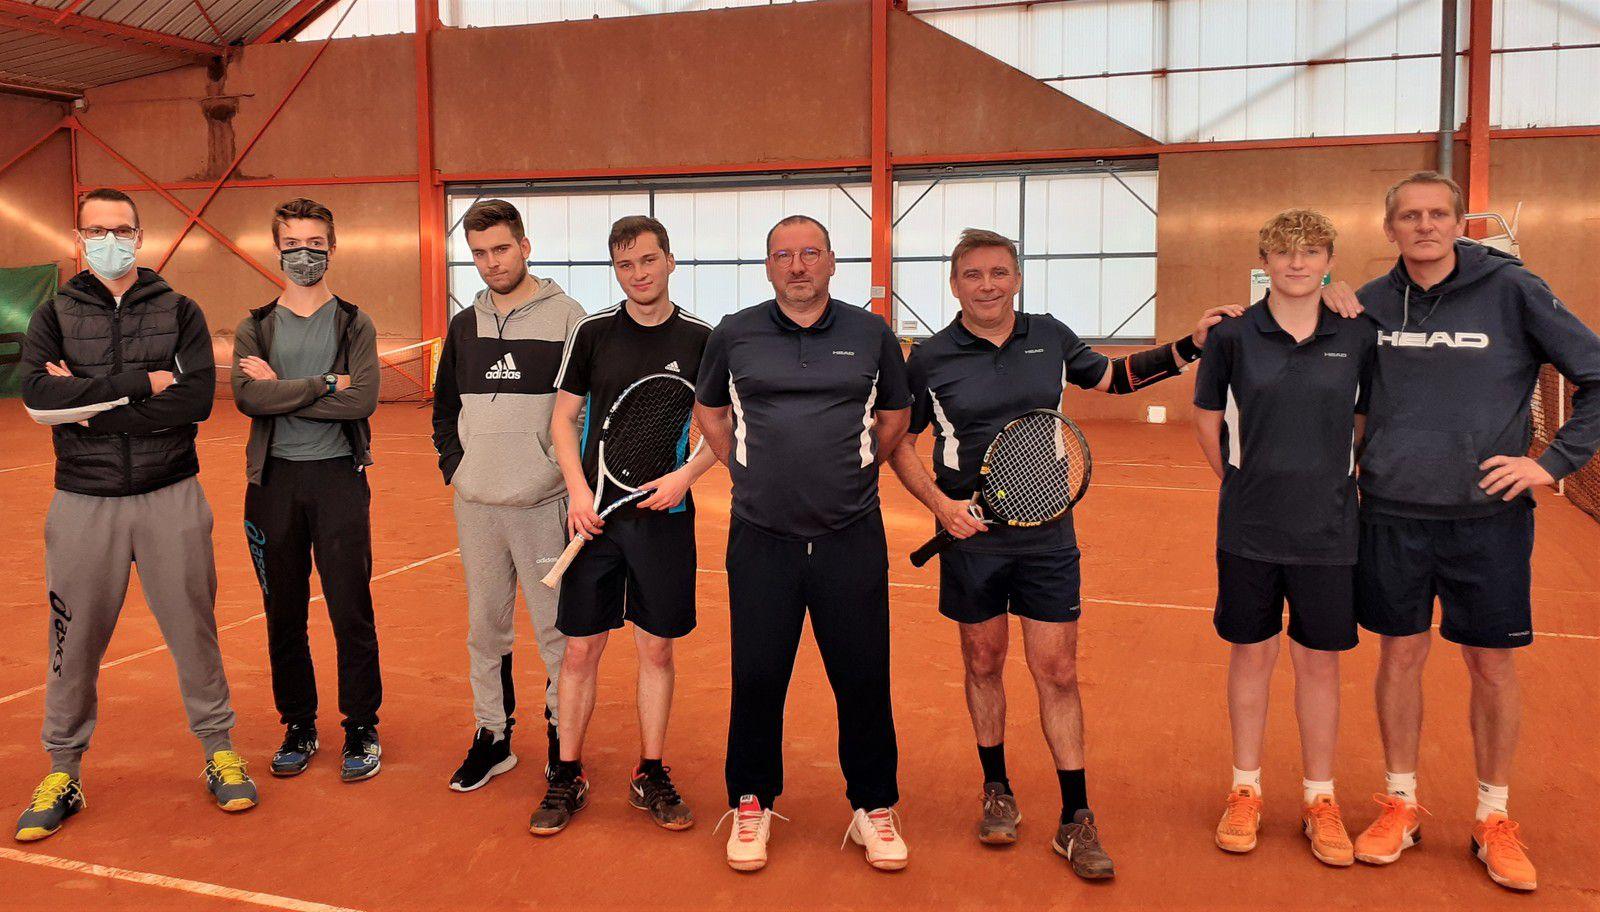 L'équipe d'Orbec, Olivier Vincent, Marc Lengre, Augustin et Bernard Caillet